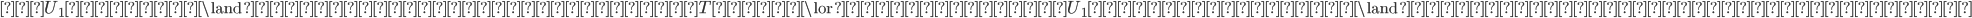 {(U_1の署名 \land 絶対的タイムロック(T))\lor(送信者とU_1のマルチシグ \land 相対的タイムロック(Δ))}